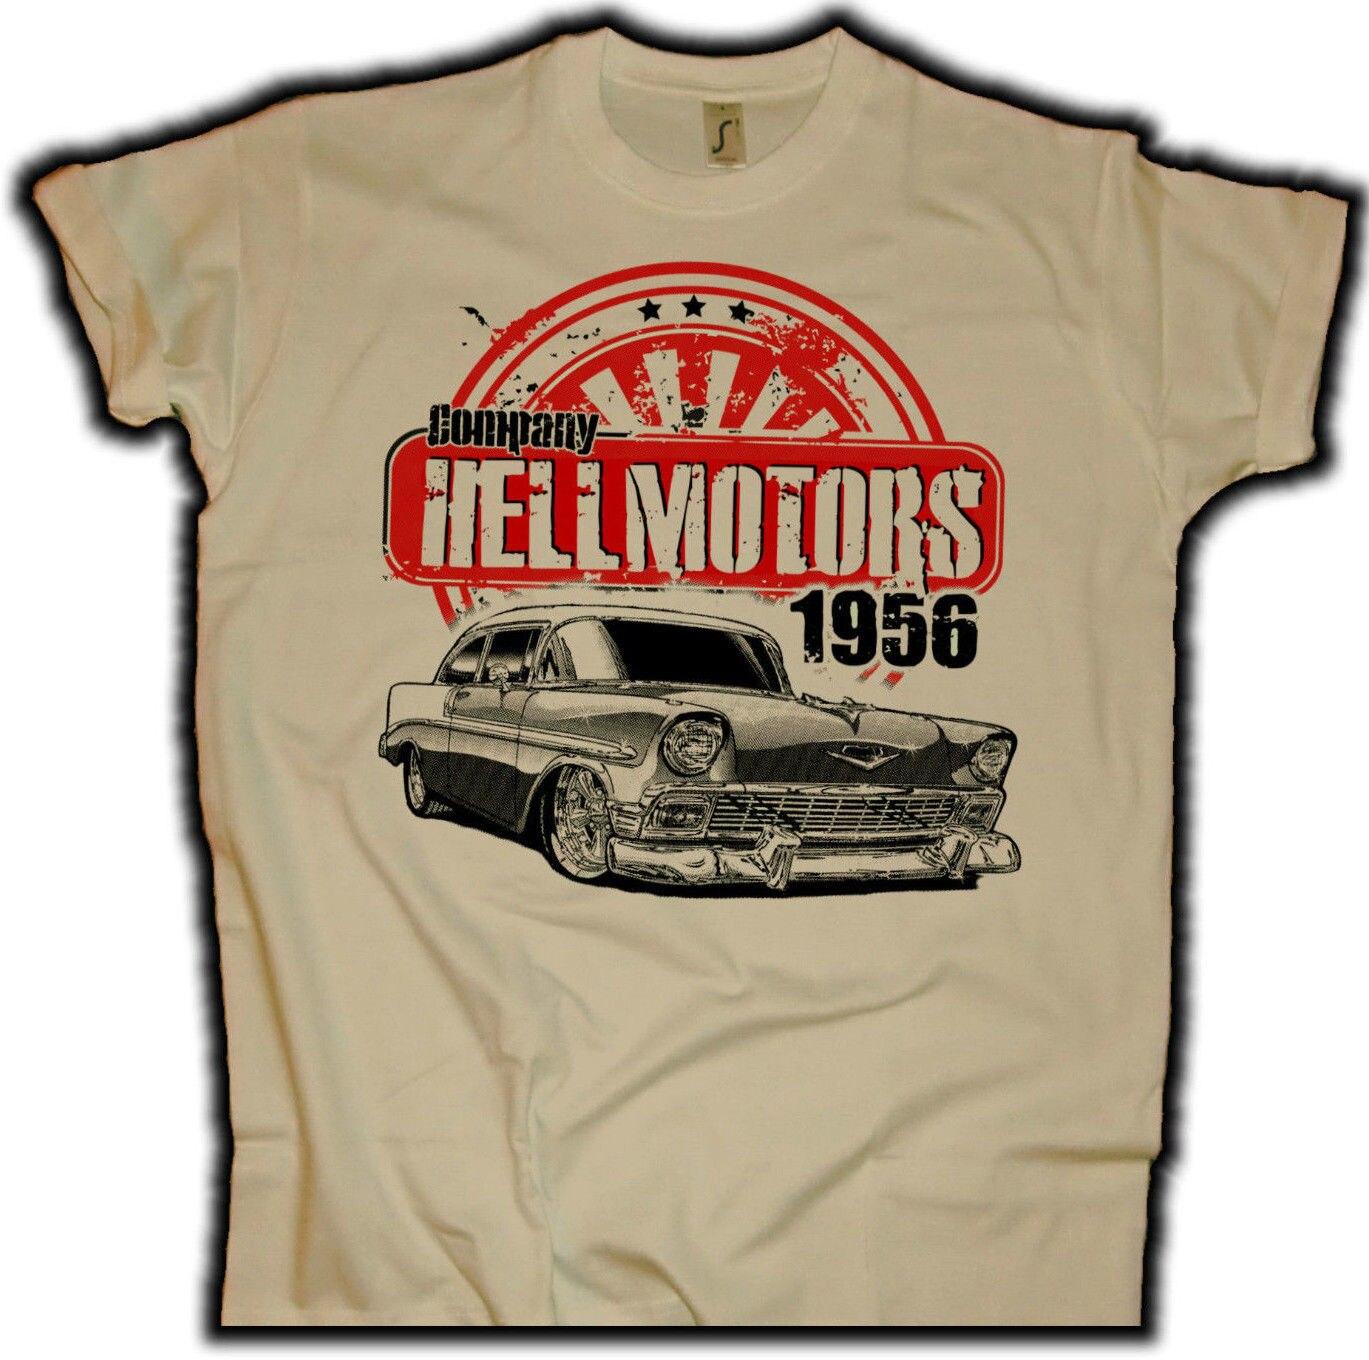 Модная мужская футболка, бесплатная доставка, Chevy 56 Sand US Muscle Car Herren, футболка V8 Hot Rod Drag racing Oldschool, летняя футболка